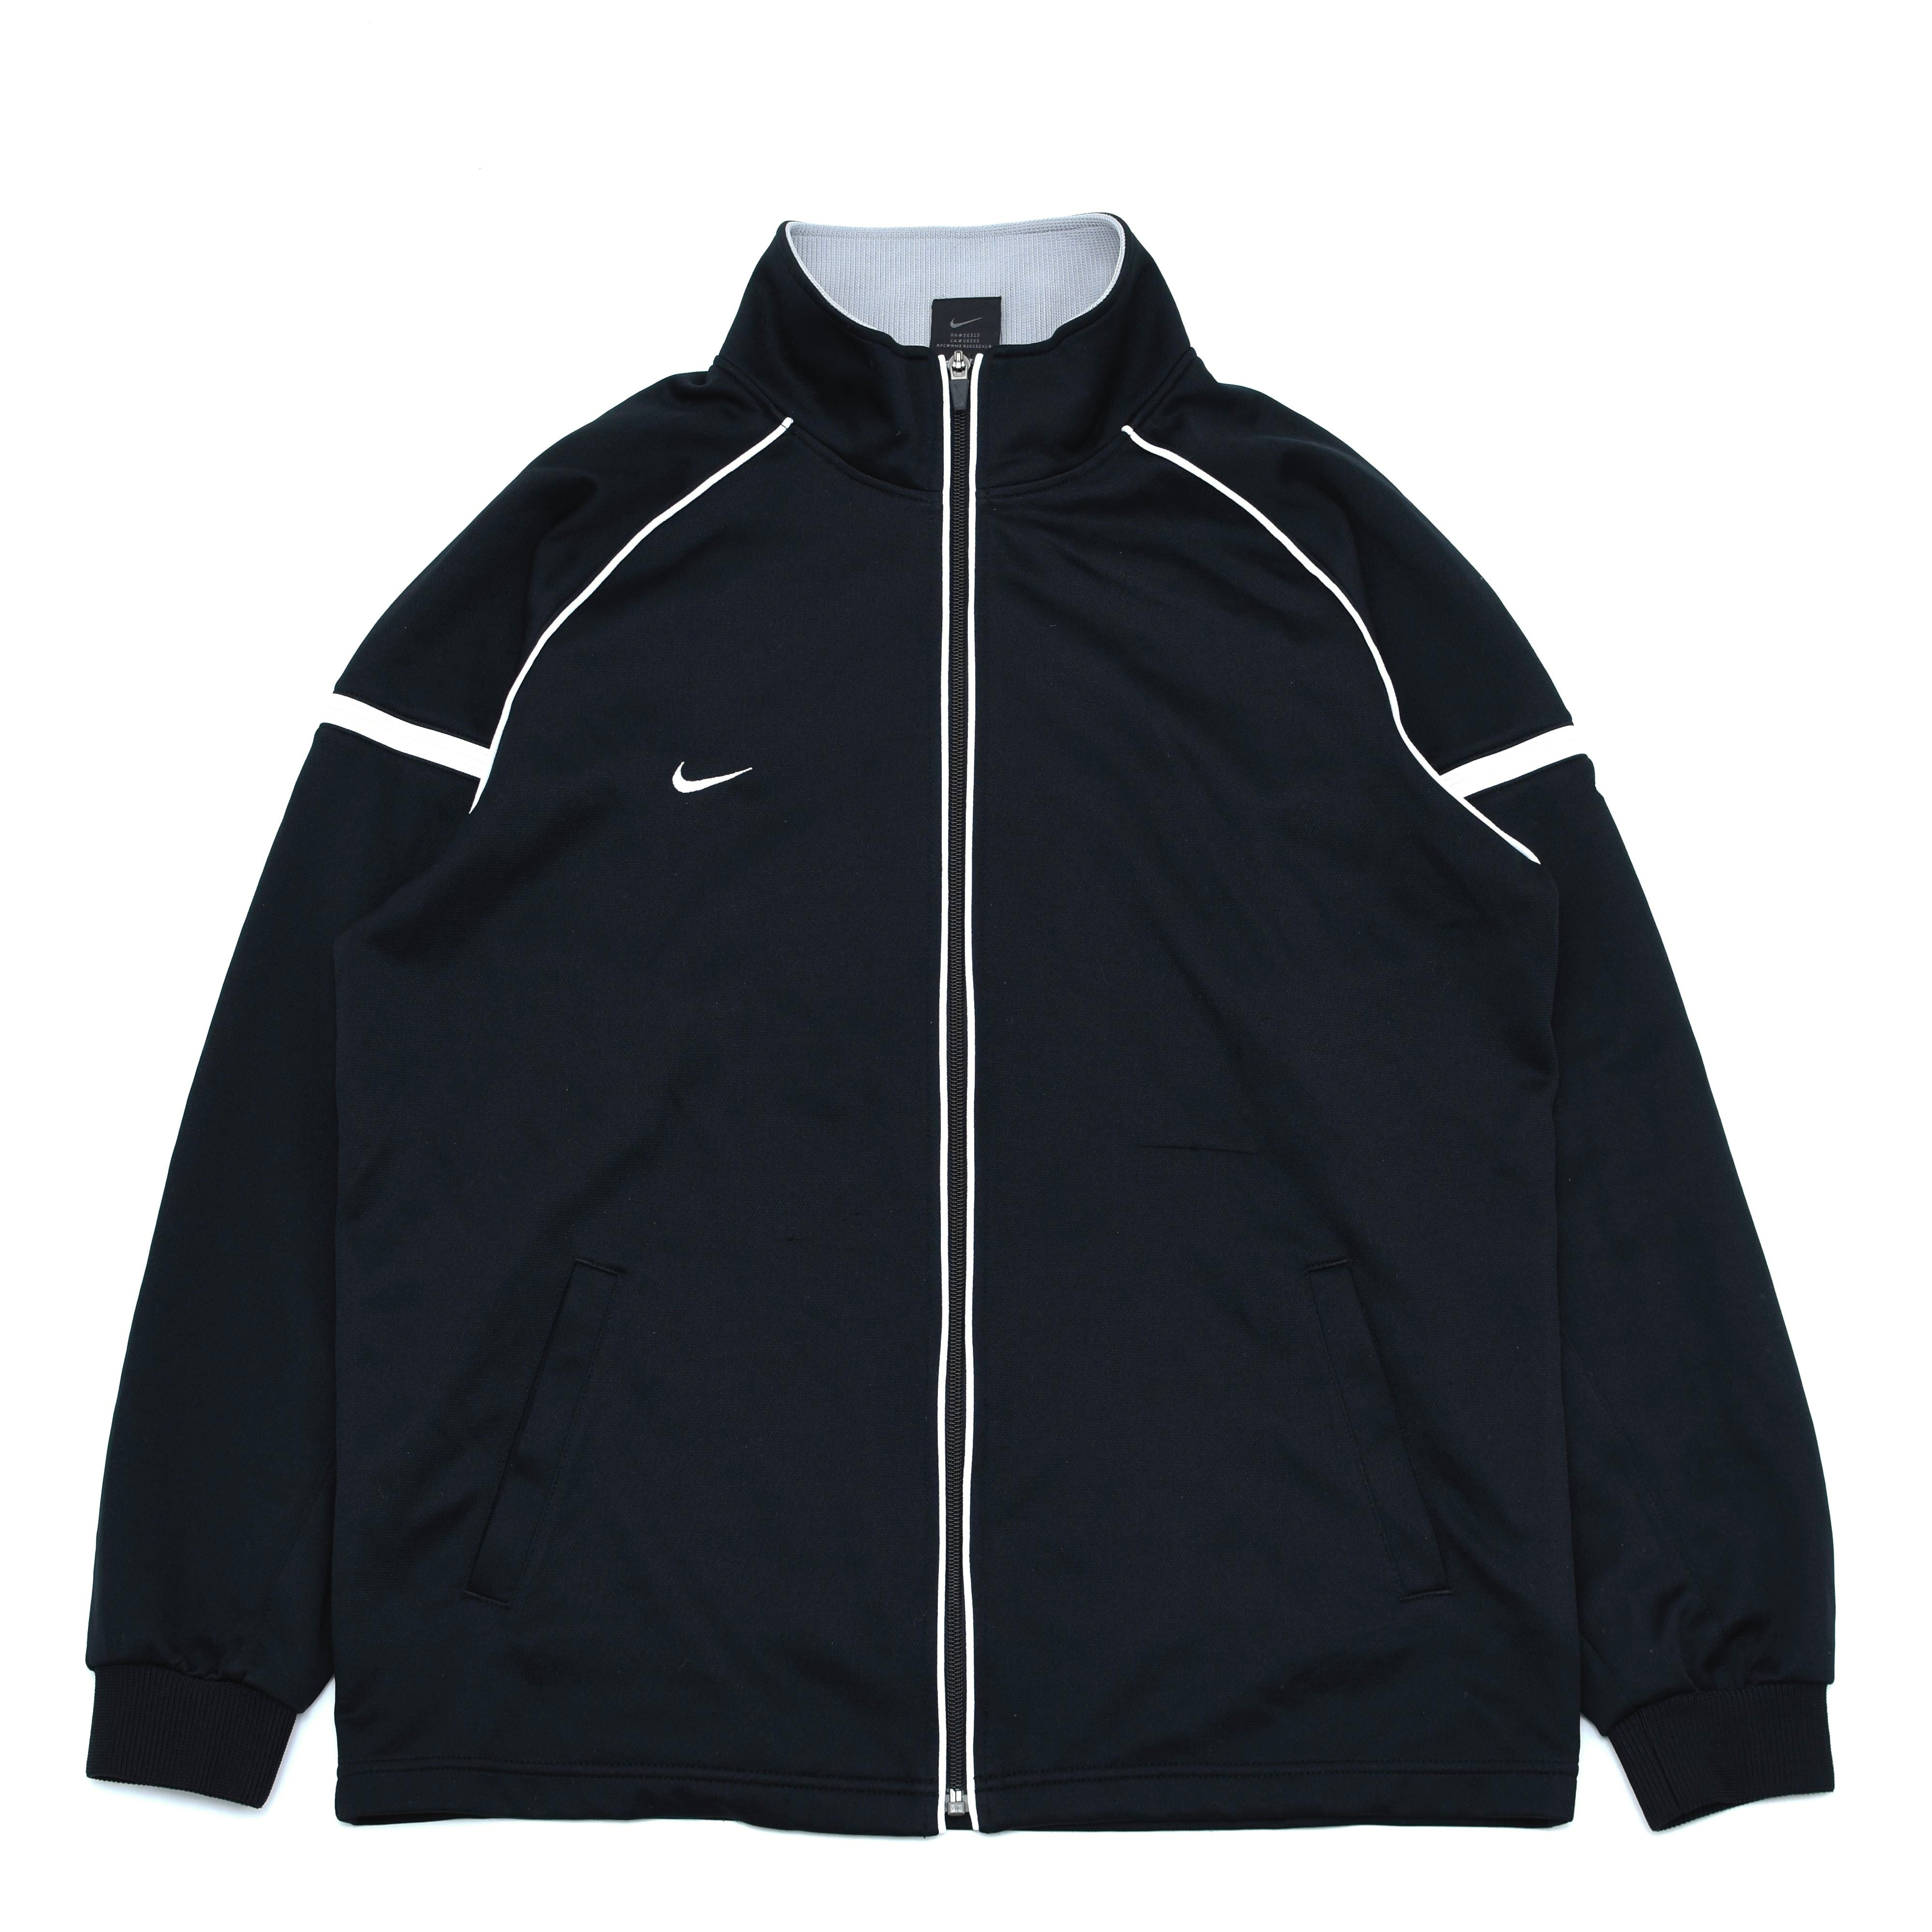 NIKE one point logo piping track jacket